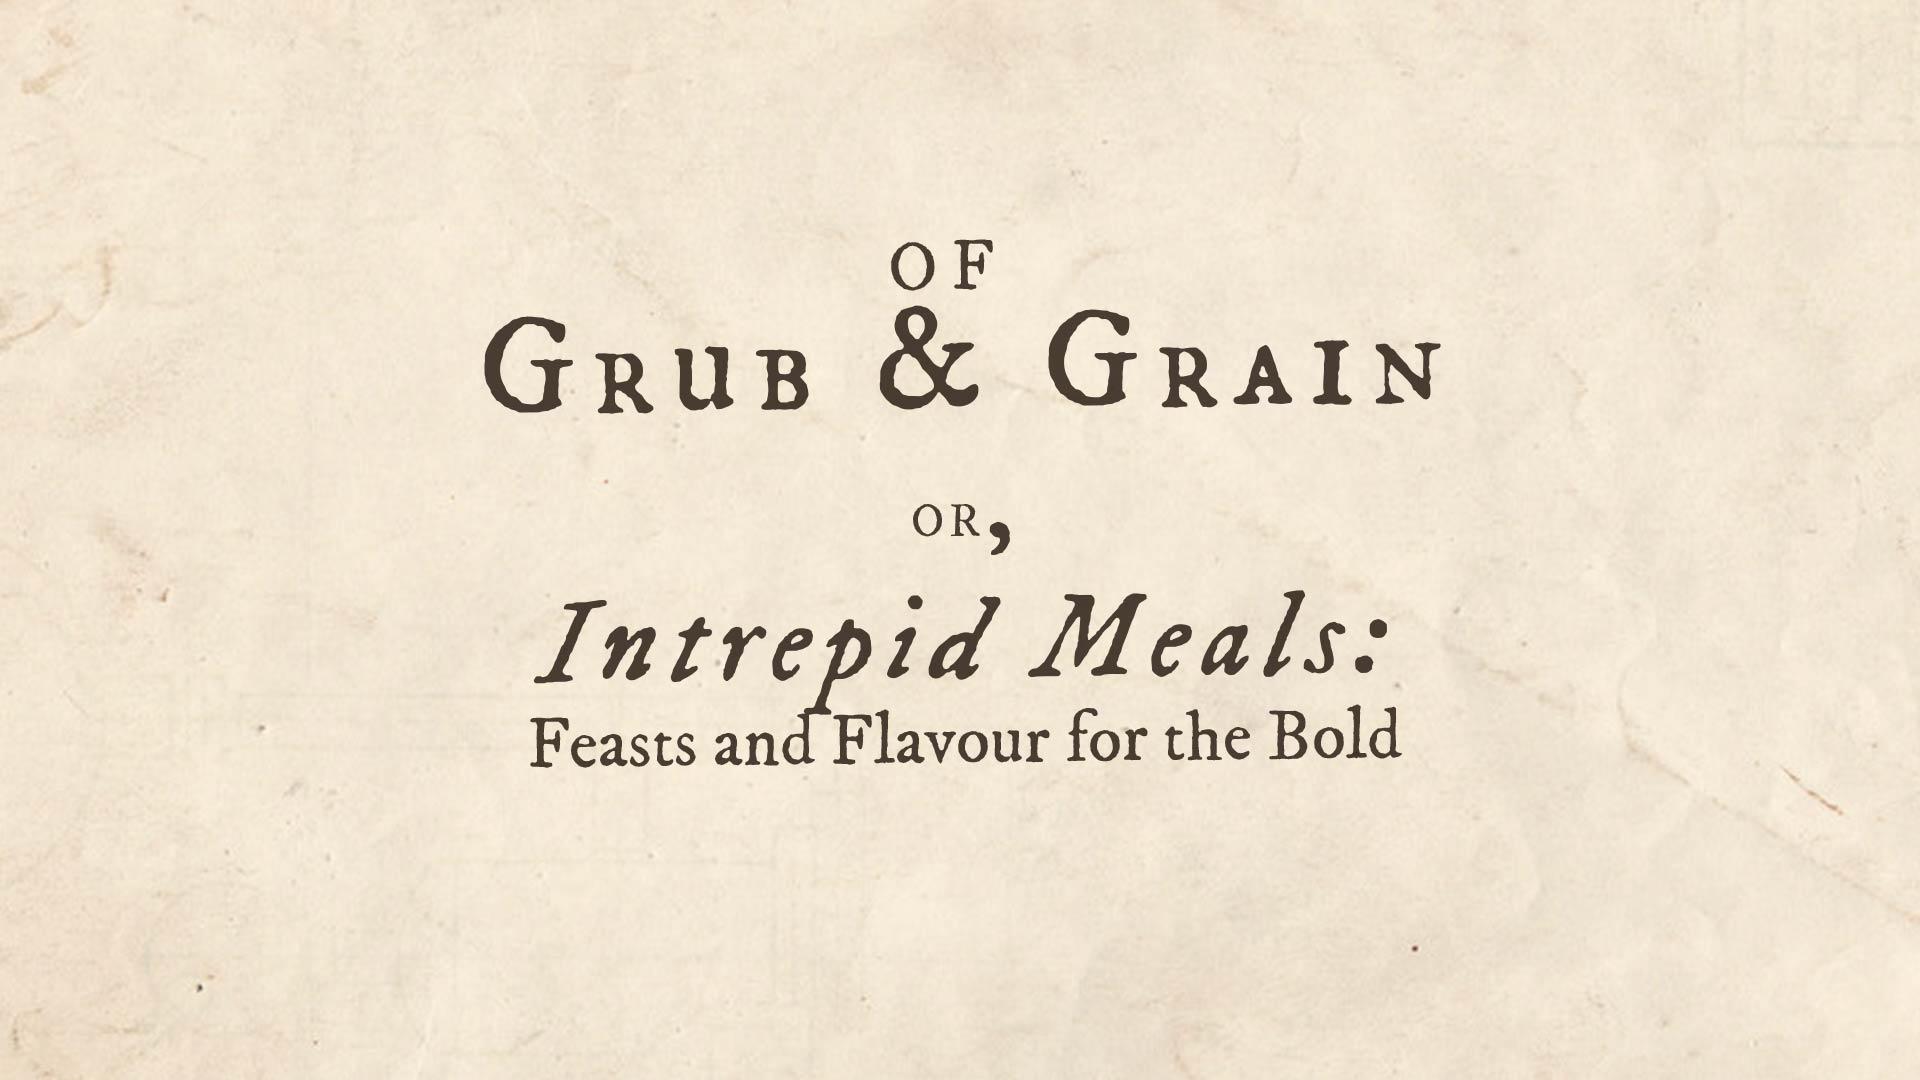 Of Grub & Grain